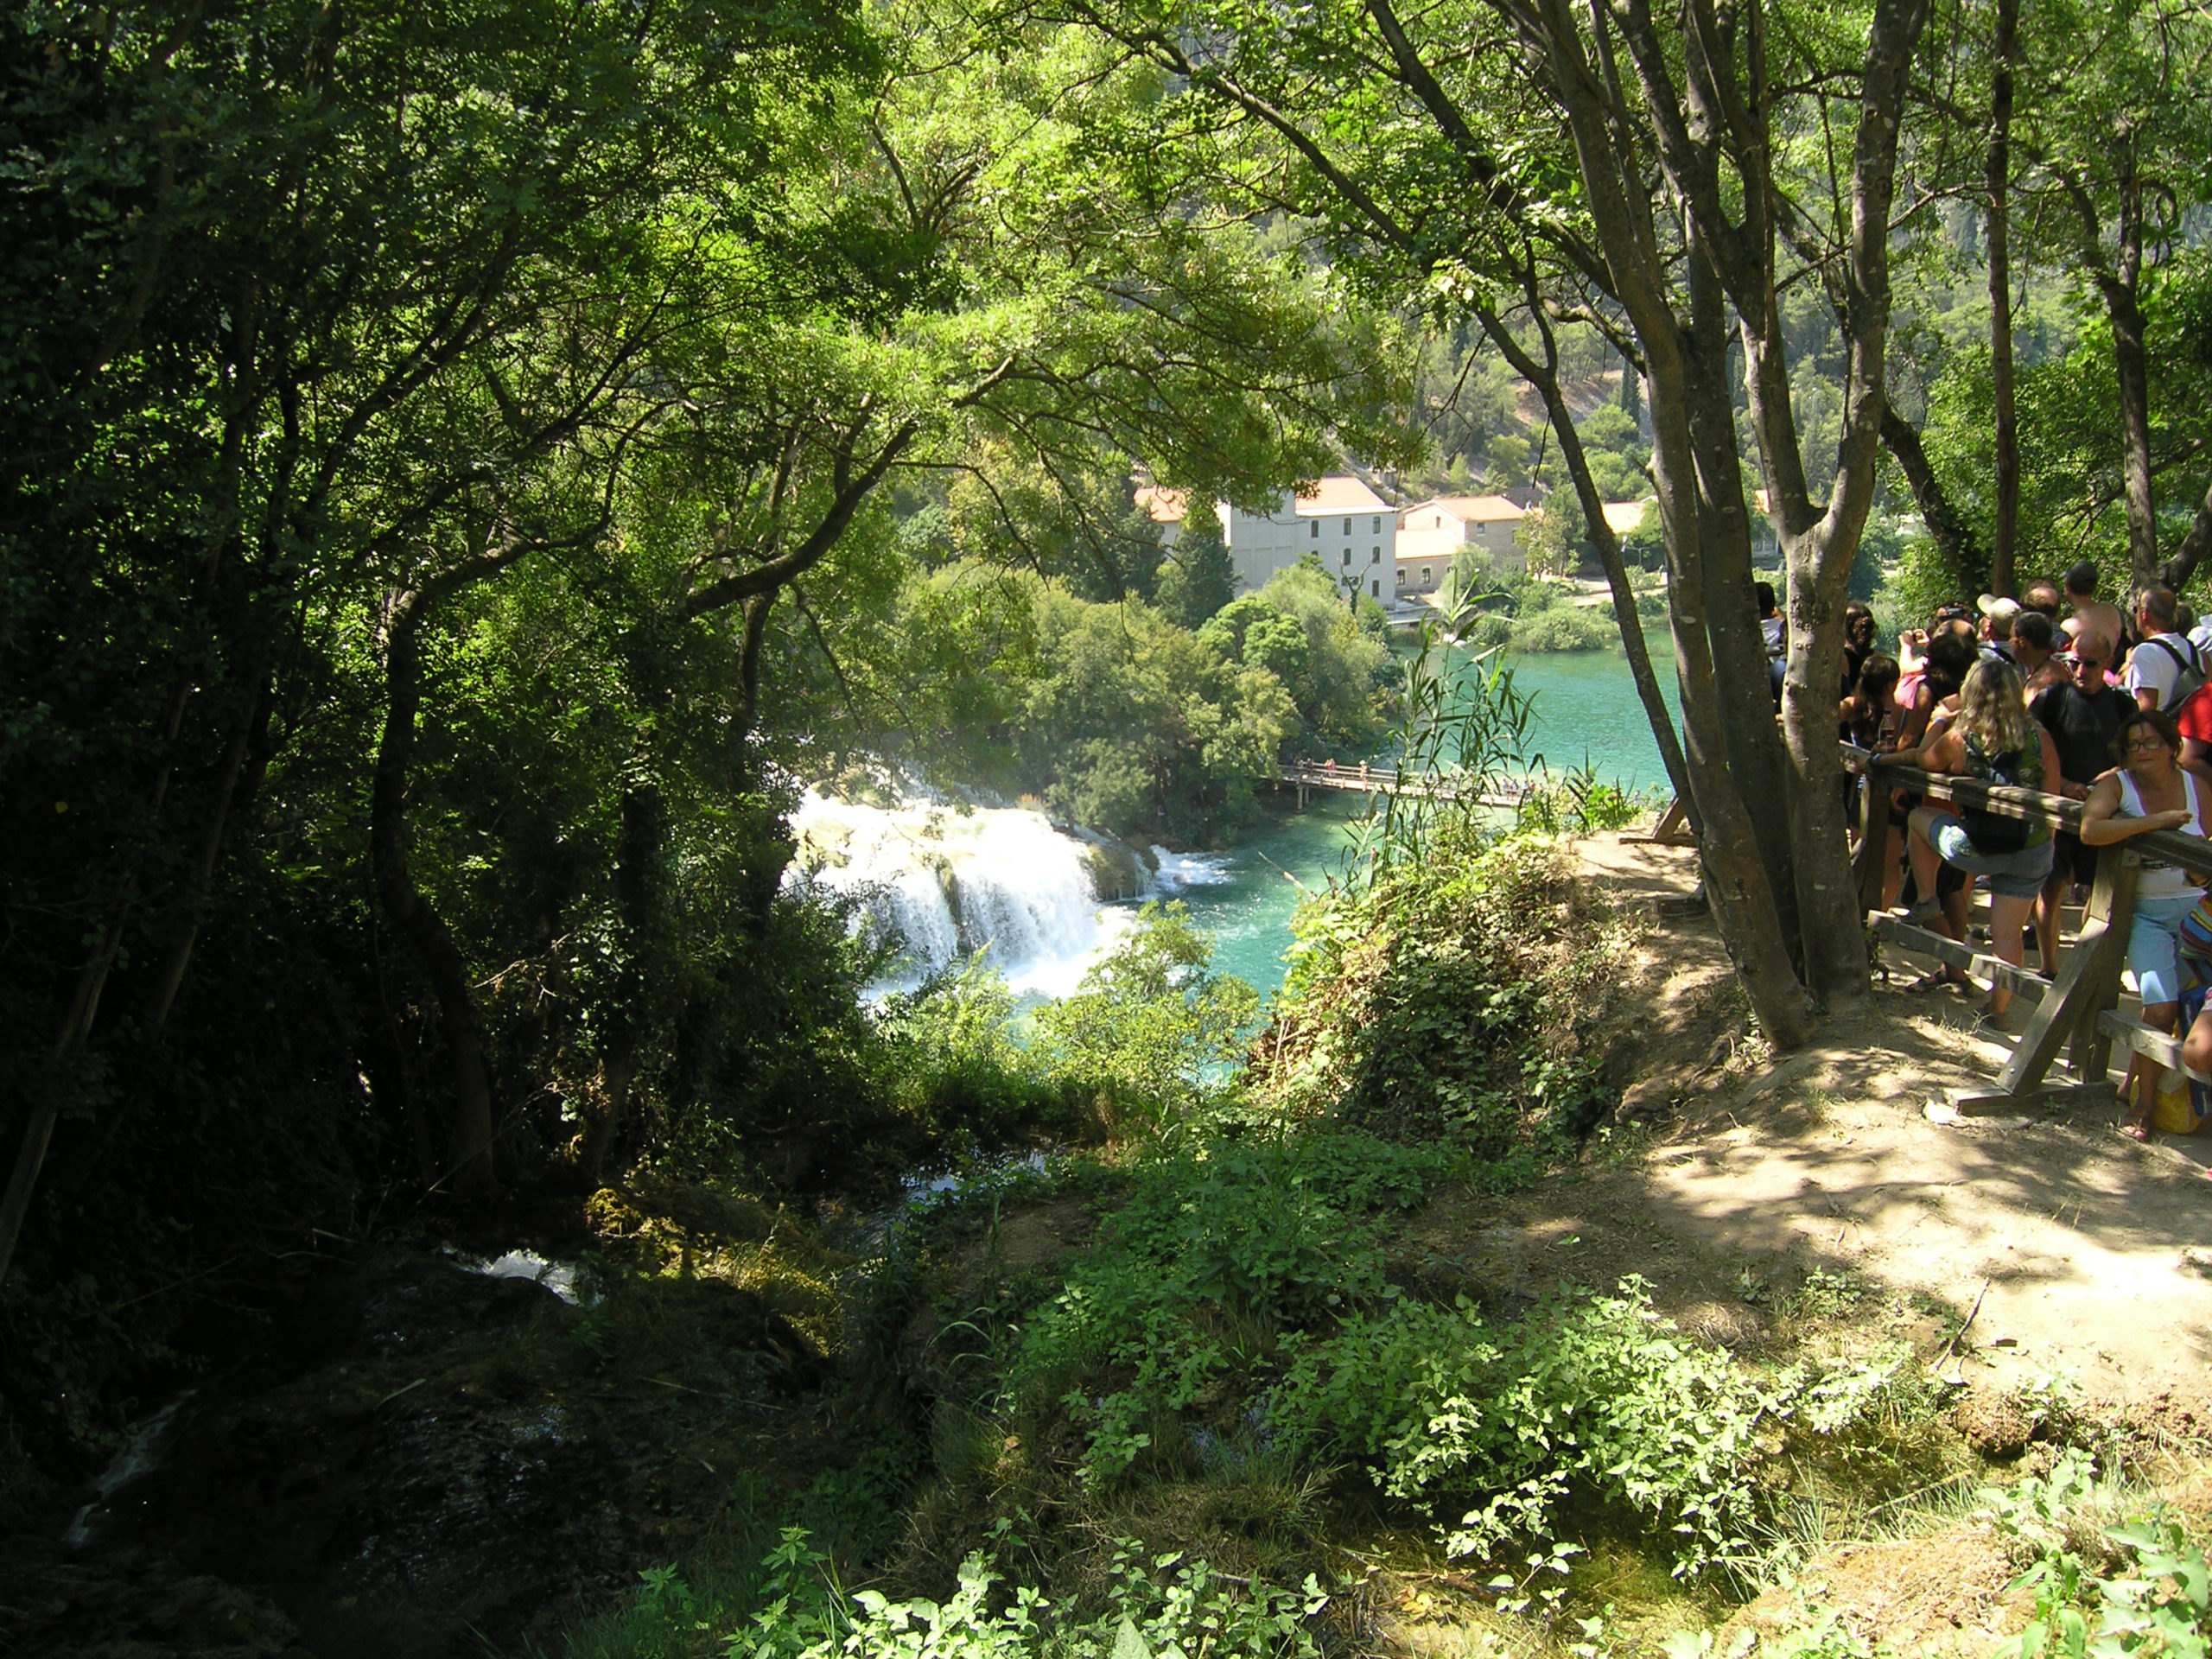 Widok na wodospad